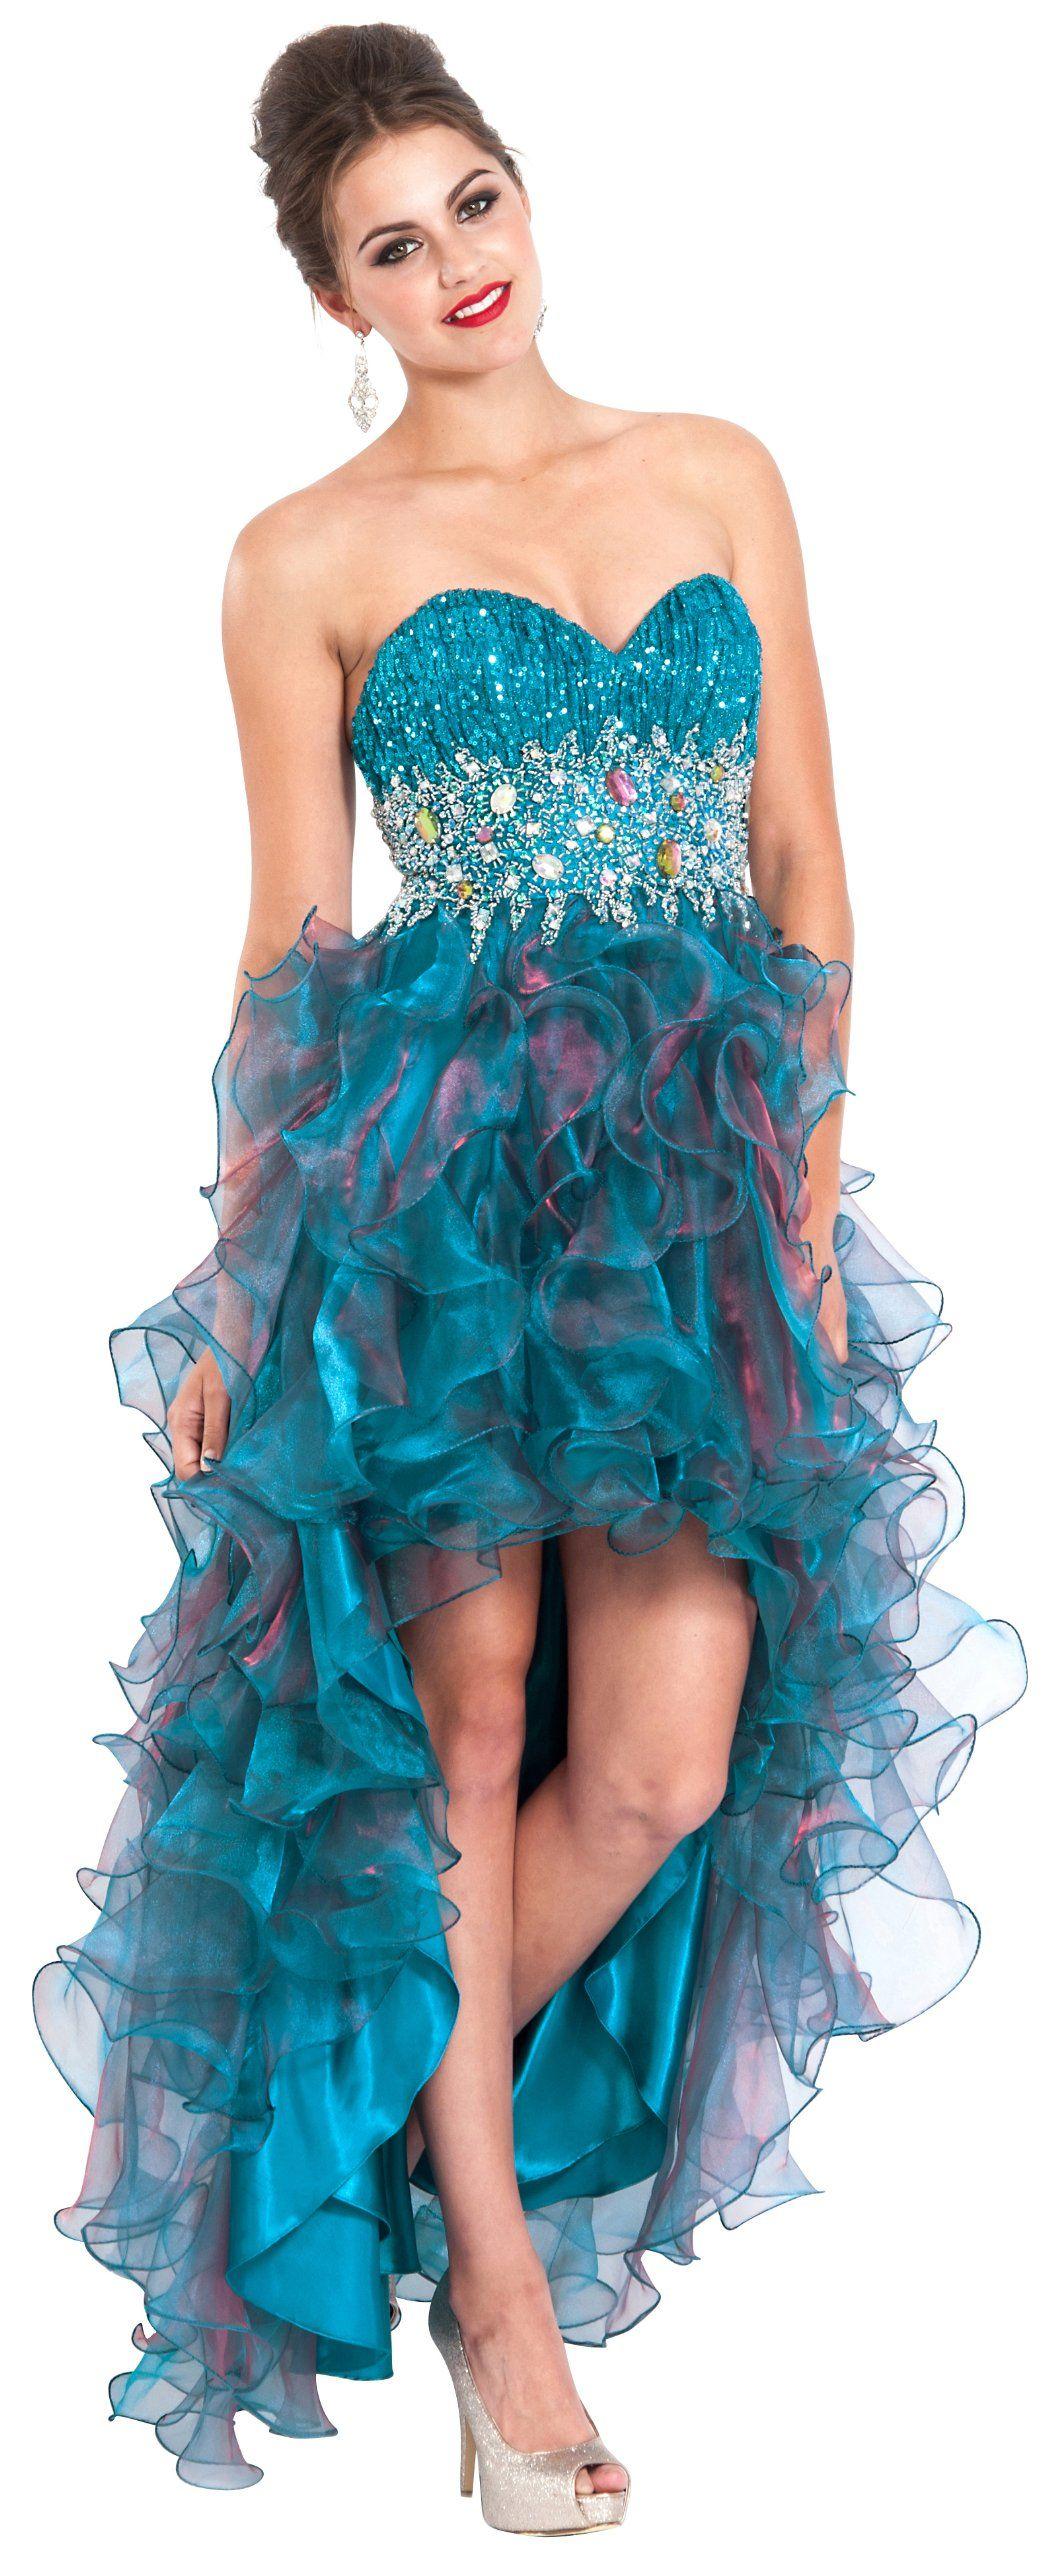 Amazon.com: Organza Gem Hi-Low Ruffle Prom Dress Homecoming Gown ...